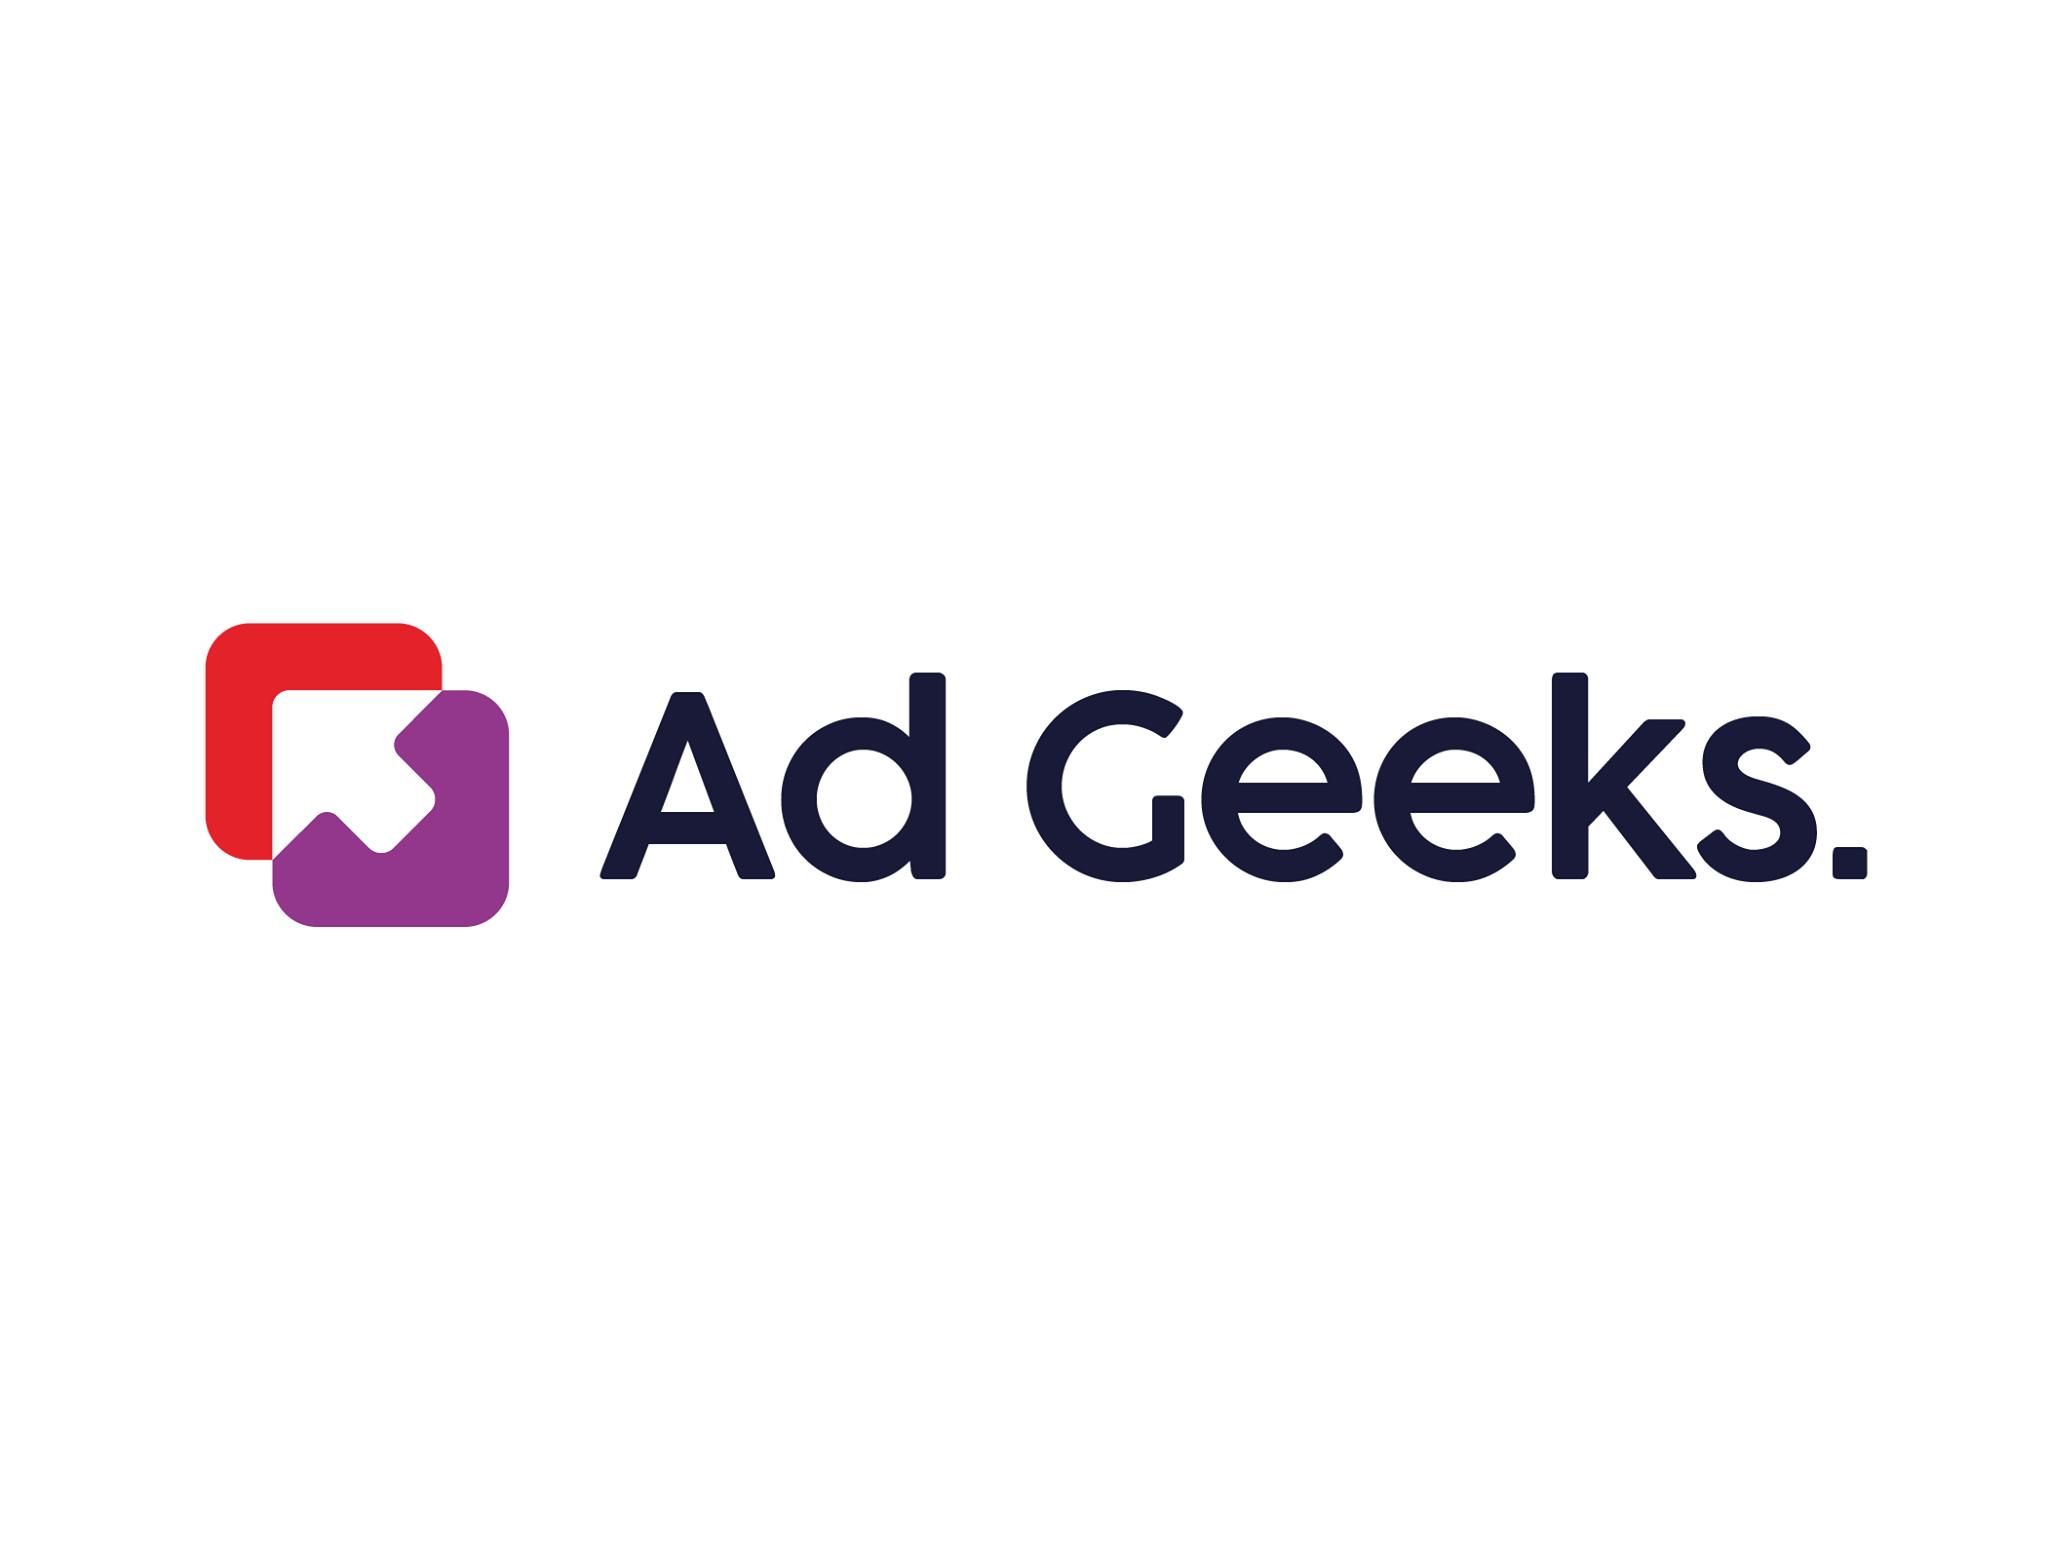 Ad Geeks